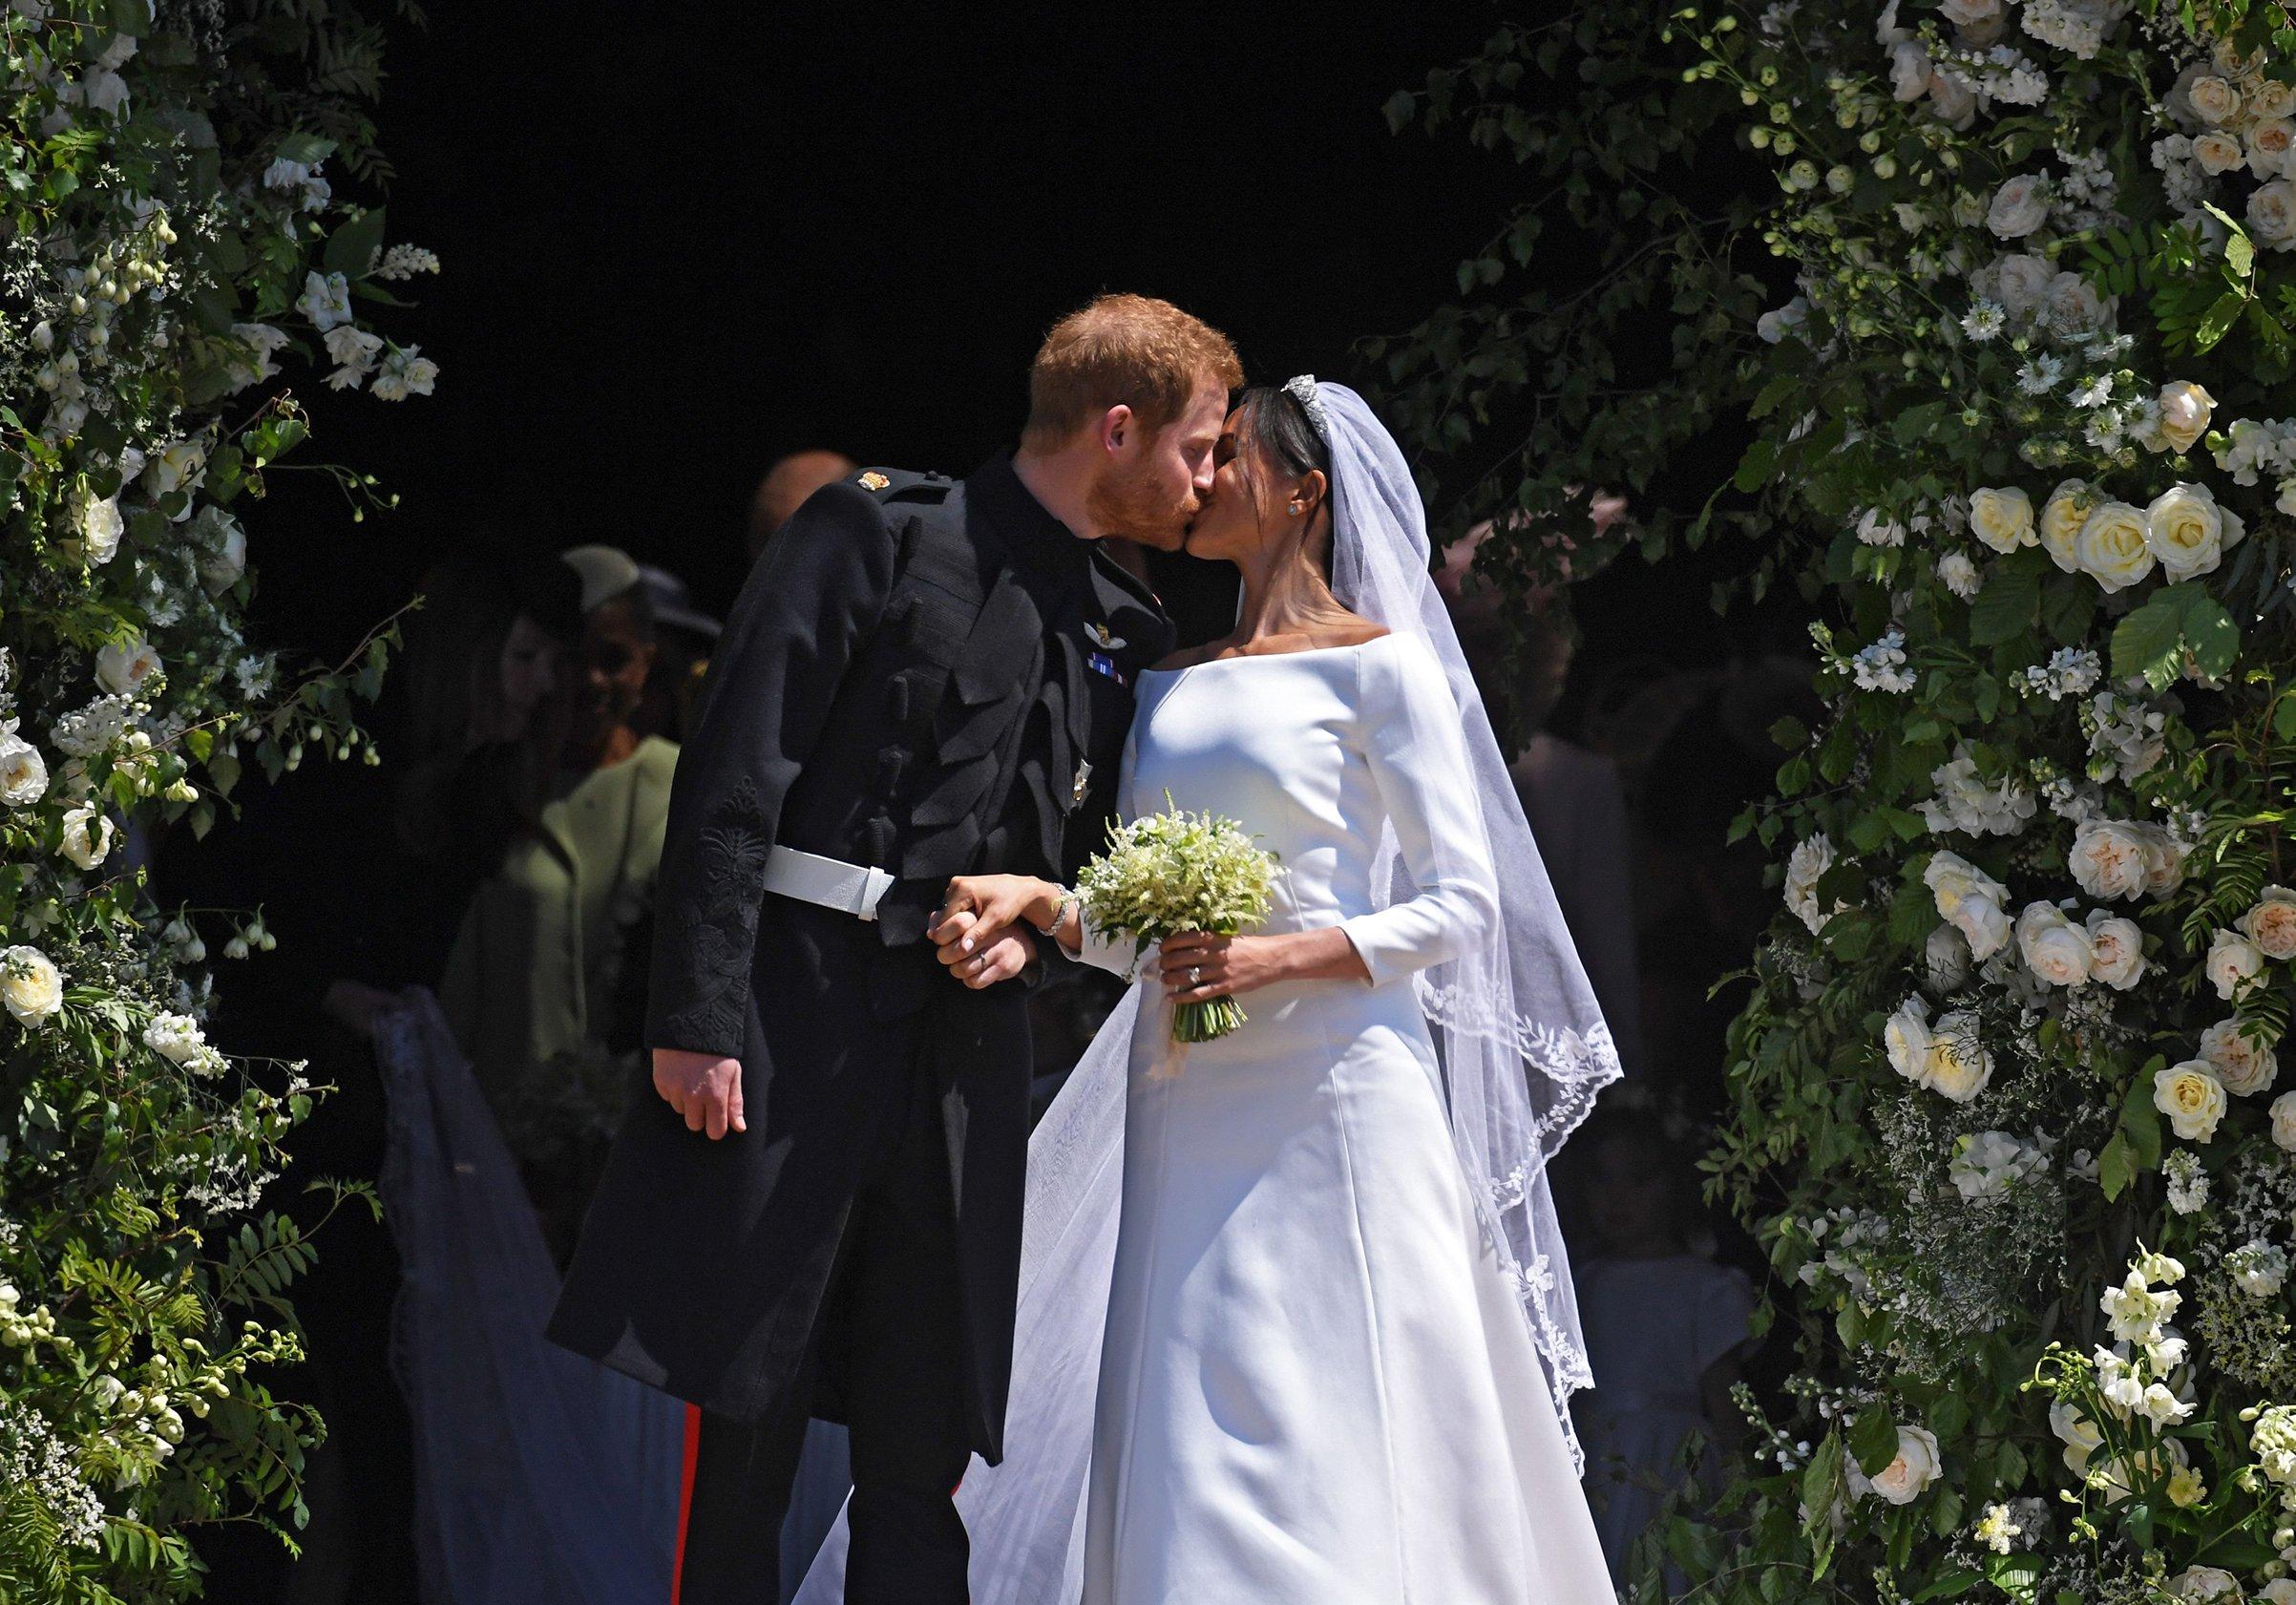 Meghan Markle Wedding Dress Designer.Meghan Markle Wedding Dress Designer Odds